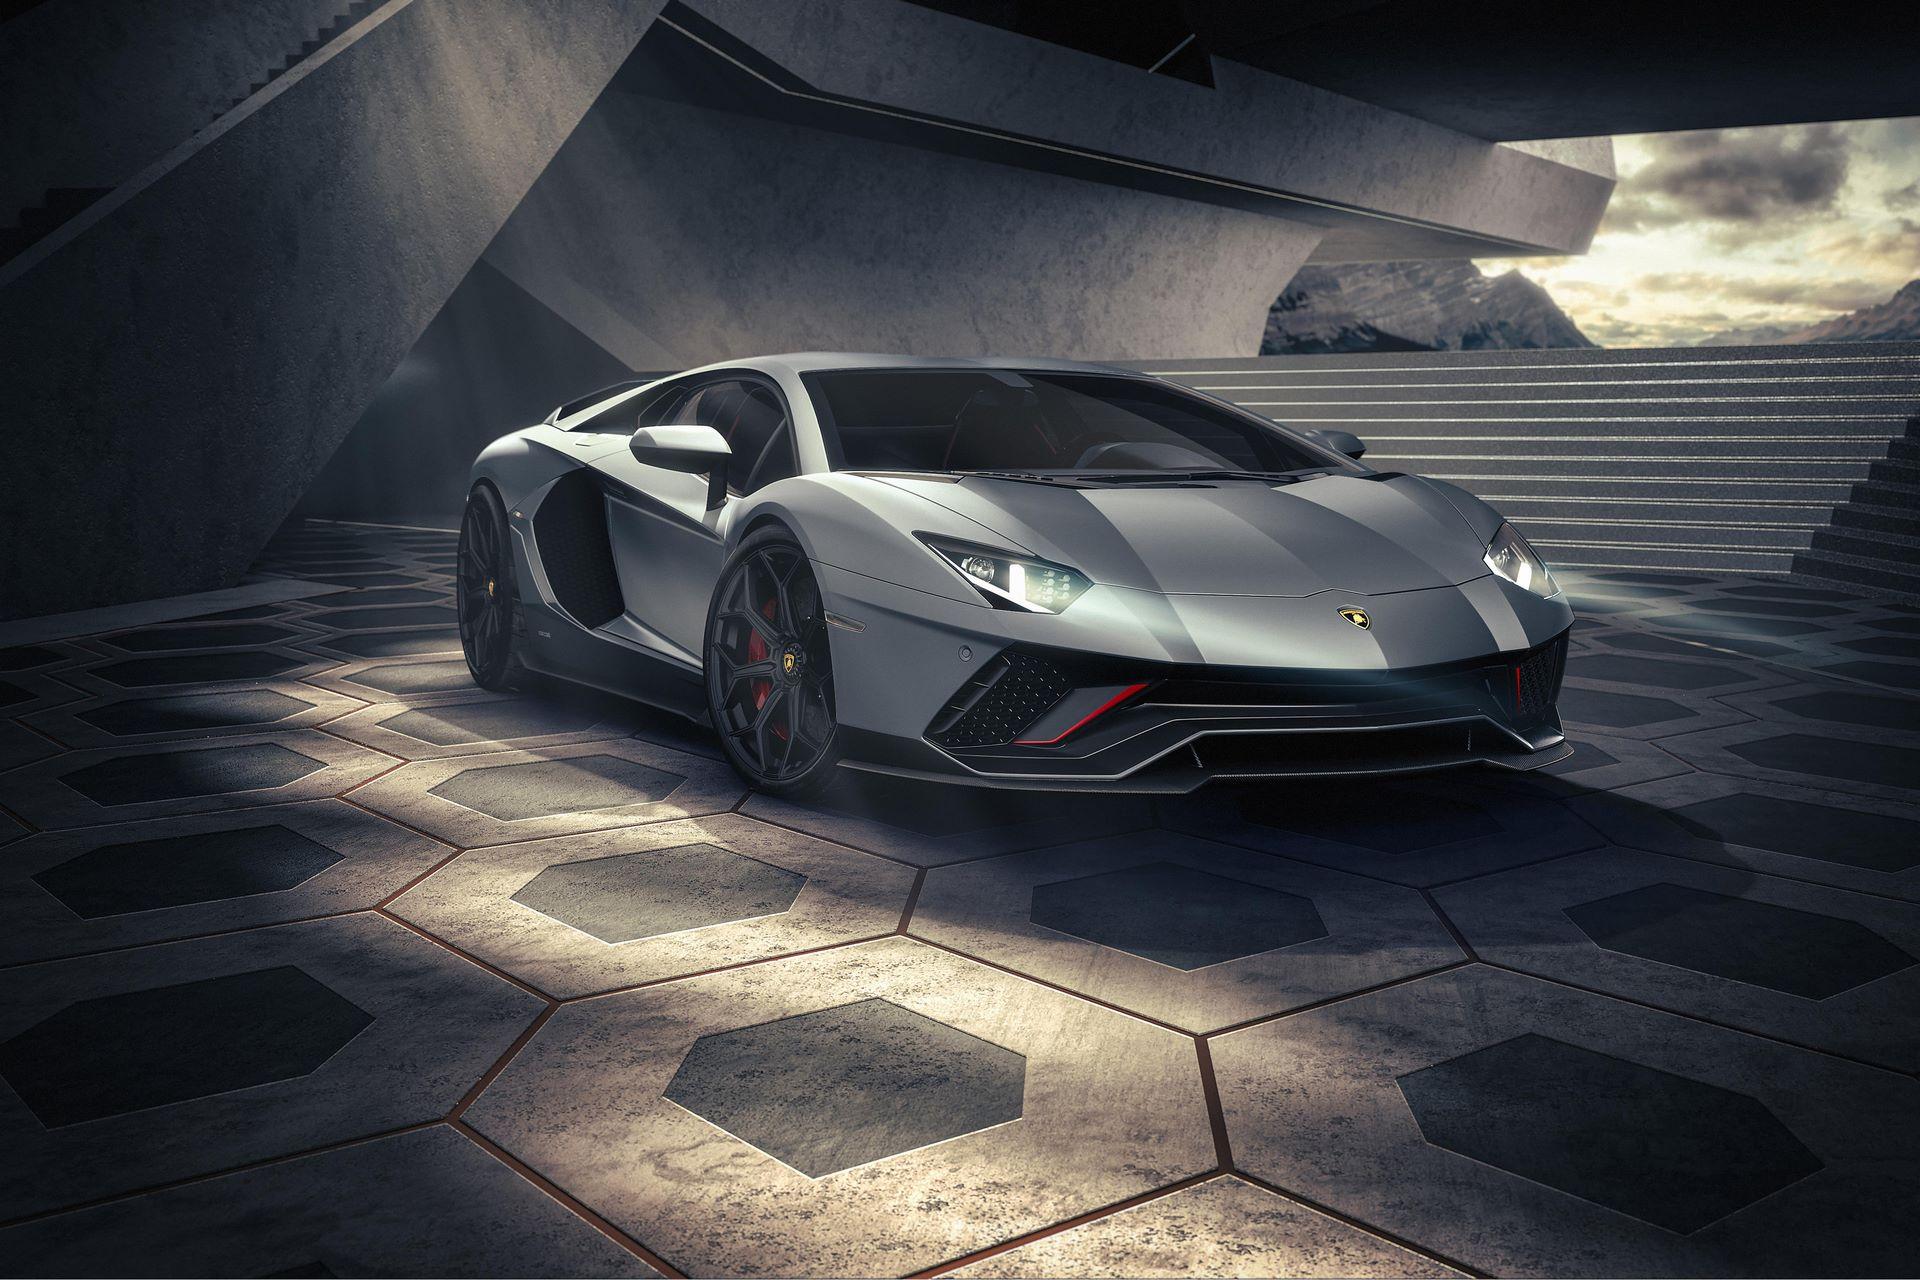 Lamborghini-Aventador-LP780-4-Ultimae-12